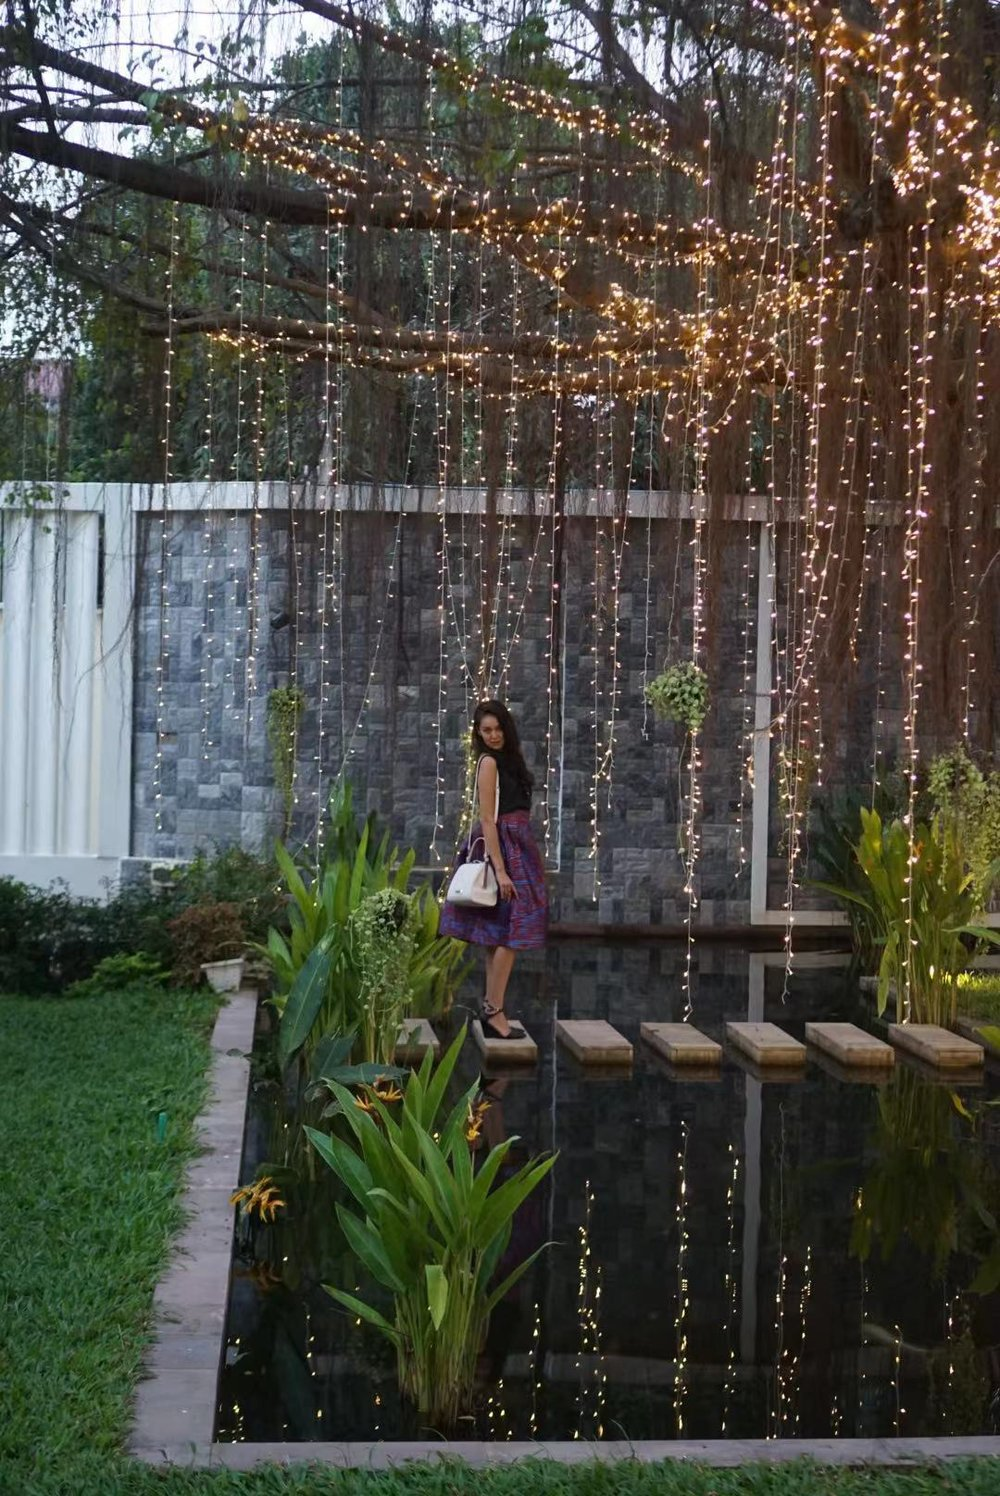 cambodia lights.jpg